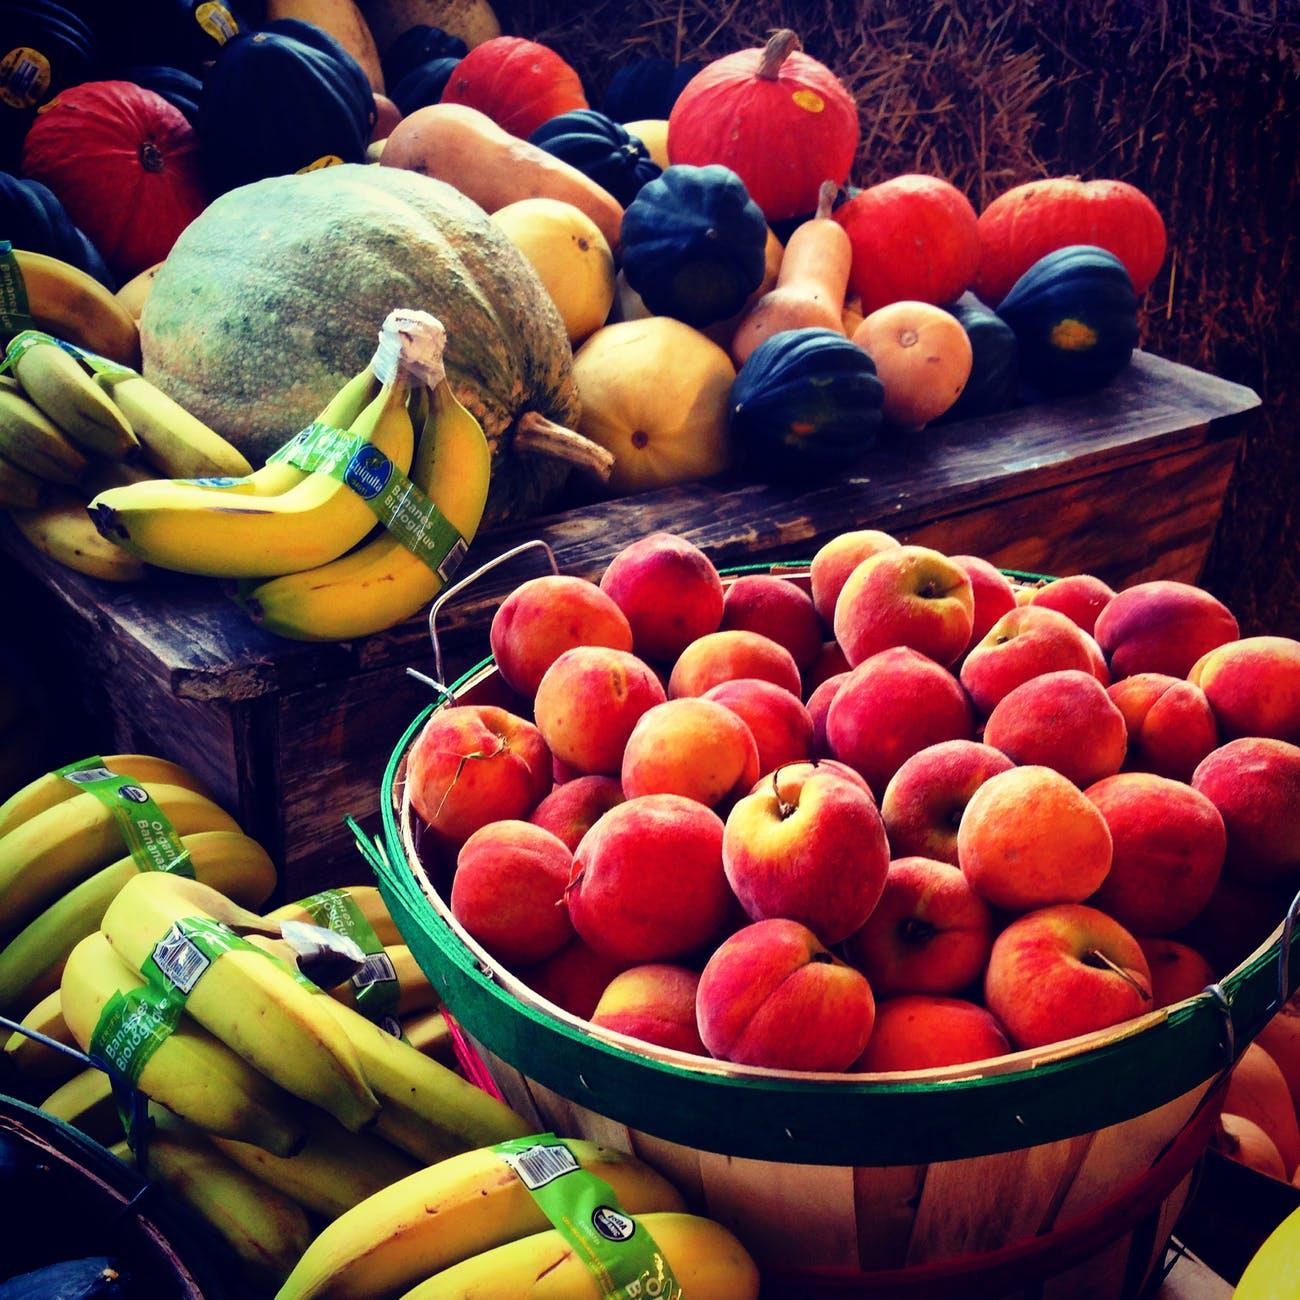 red apples in brown wooden bucket